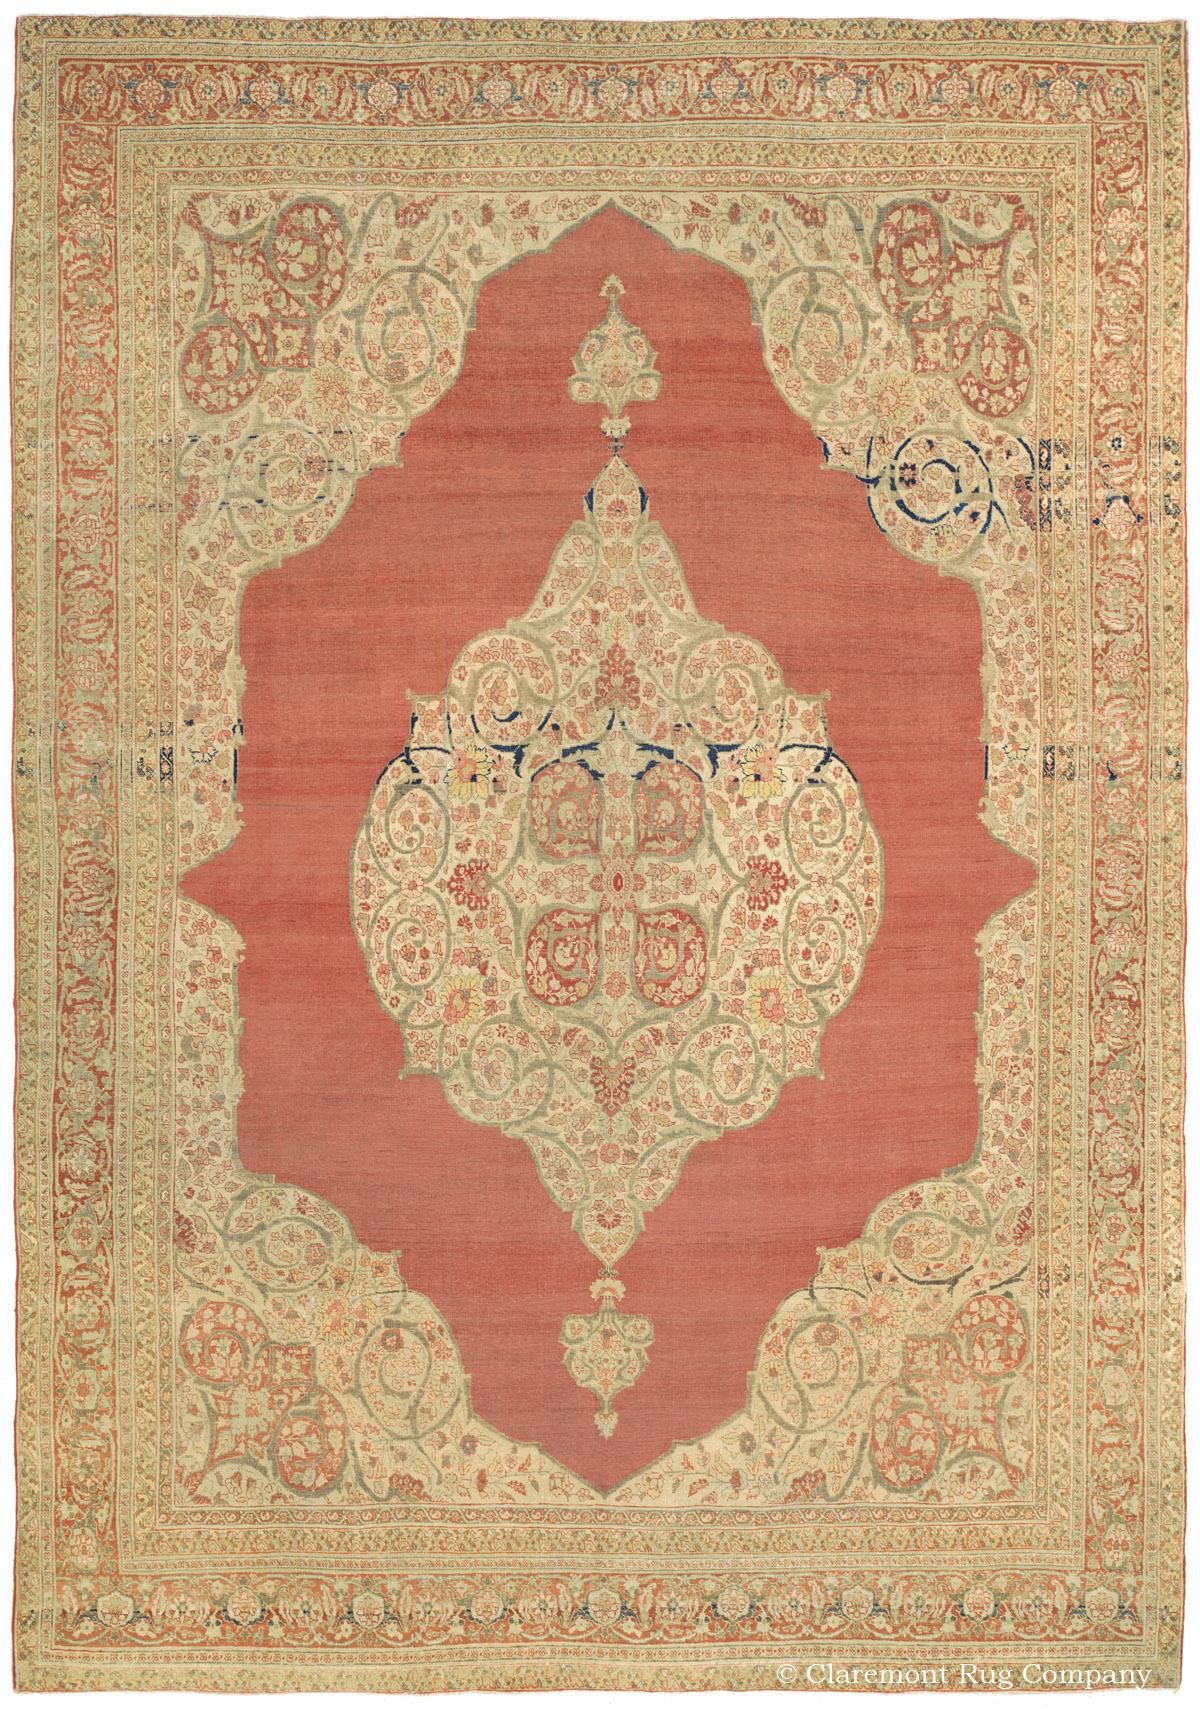 Hadji Jallili Haji Jalili Tabriz Rugs Claremont Rug Company Persian Rug Designs Vintage Persian Rug Claremont Rug Company